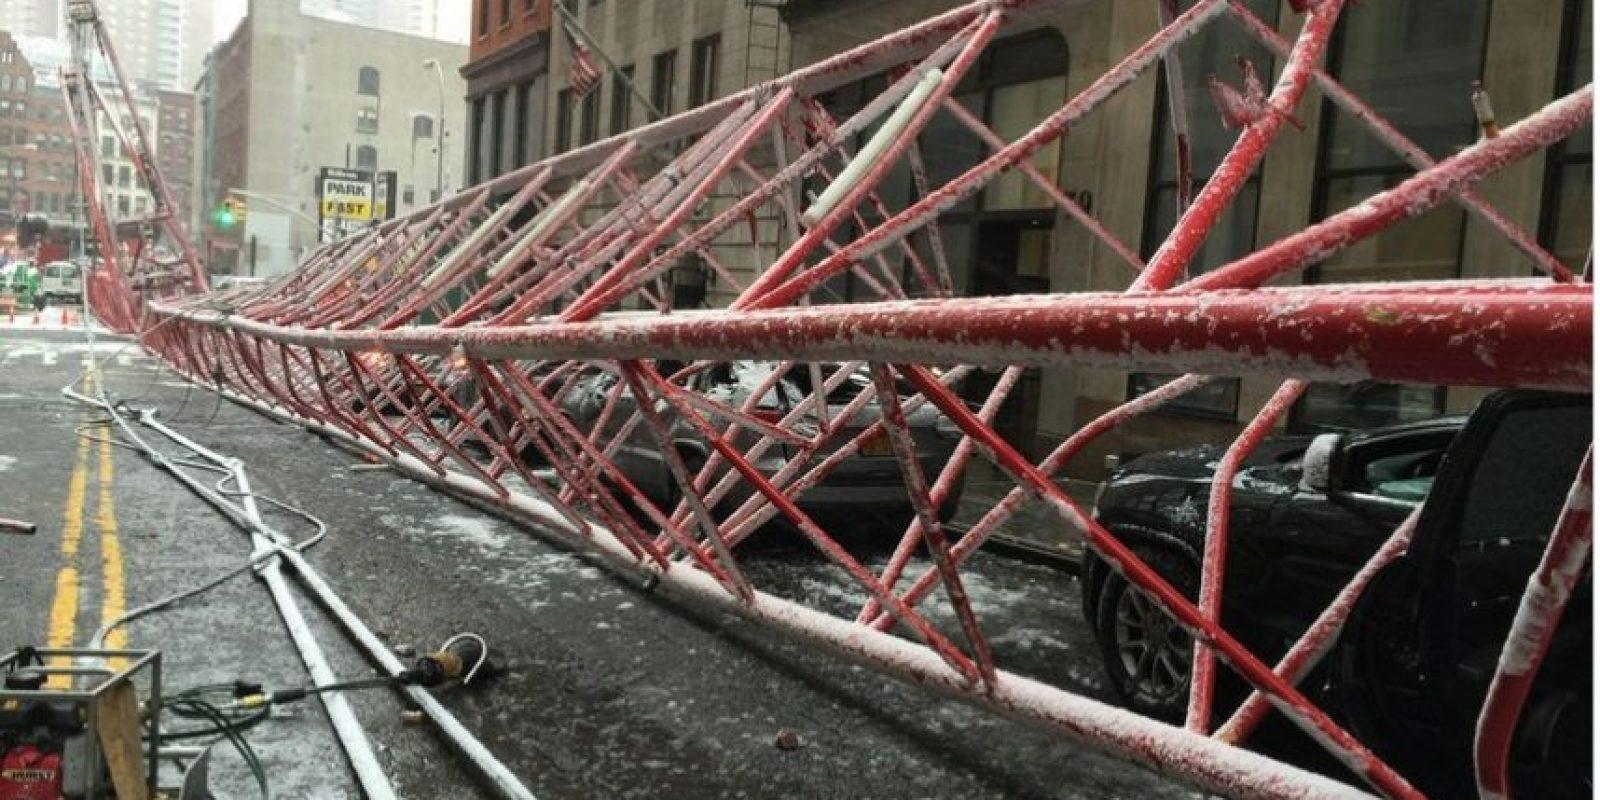 Distintos autos quedaron dañados. Foto:Vía twitter.com/FDNY